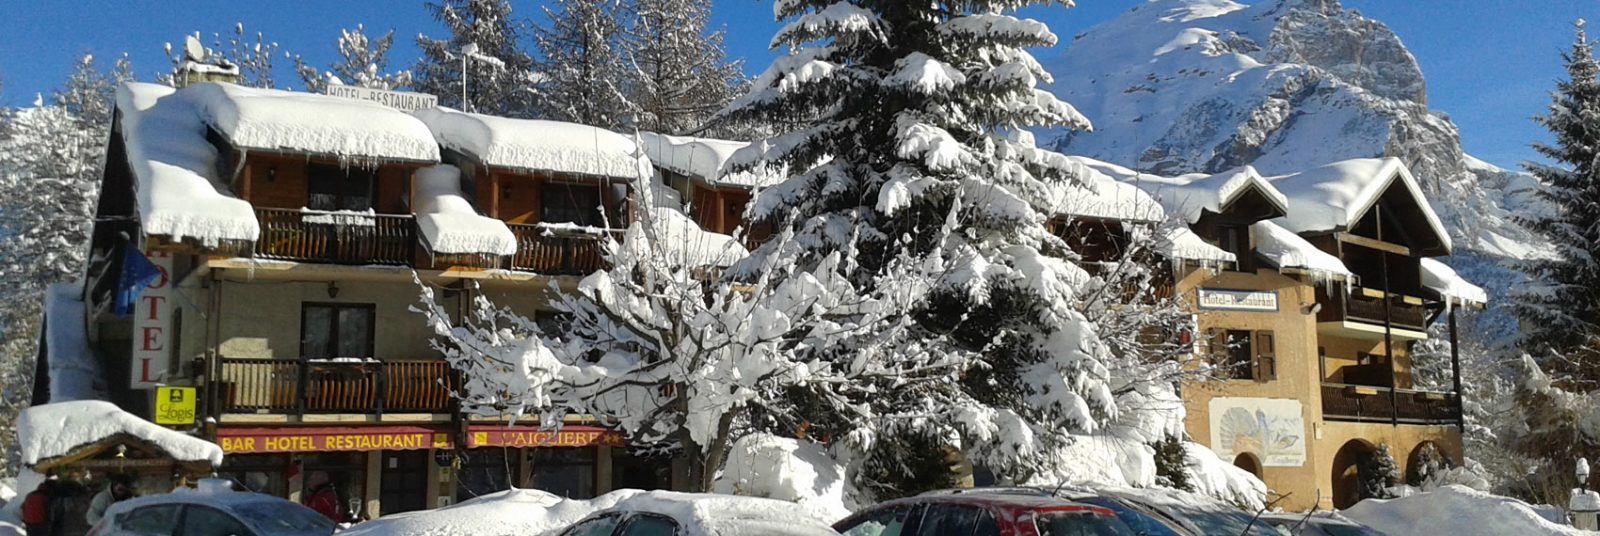 Hôtel Aiglière skiing holidays in Puy Saint Vincent